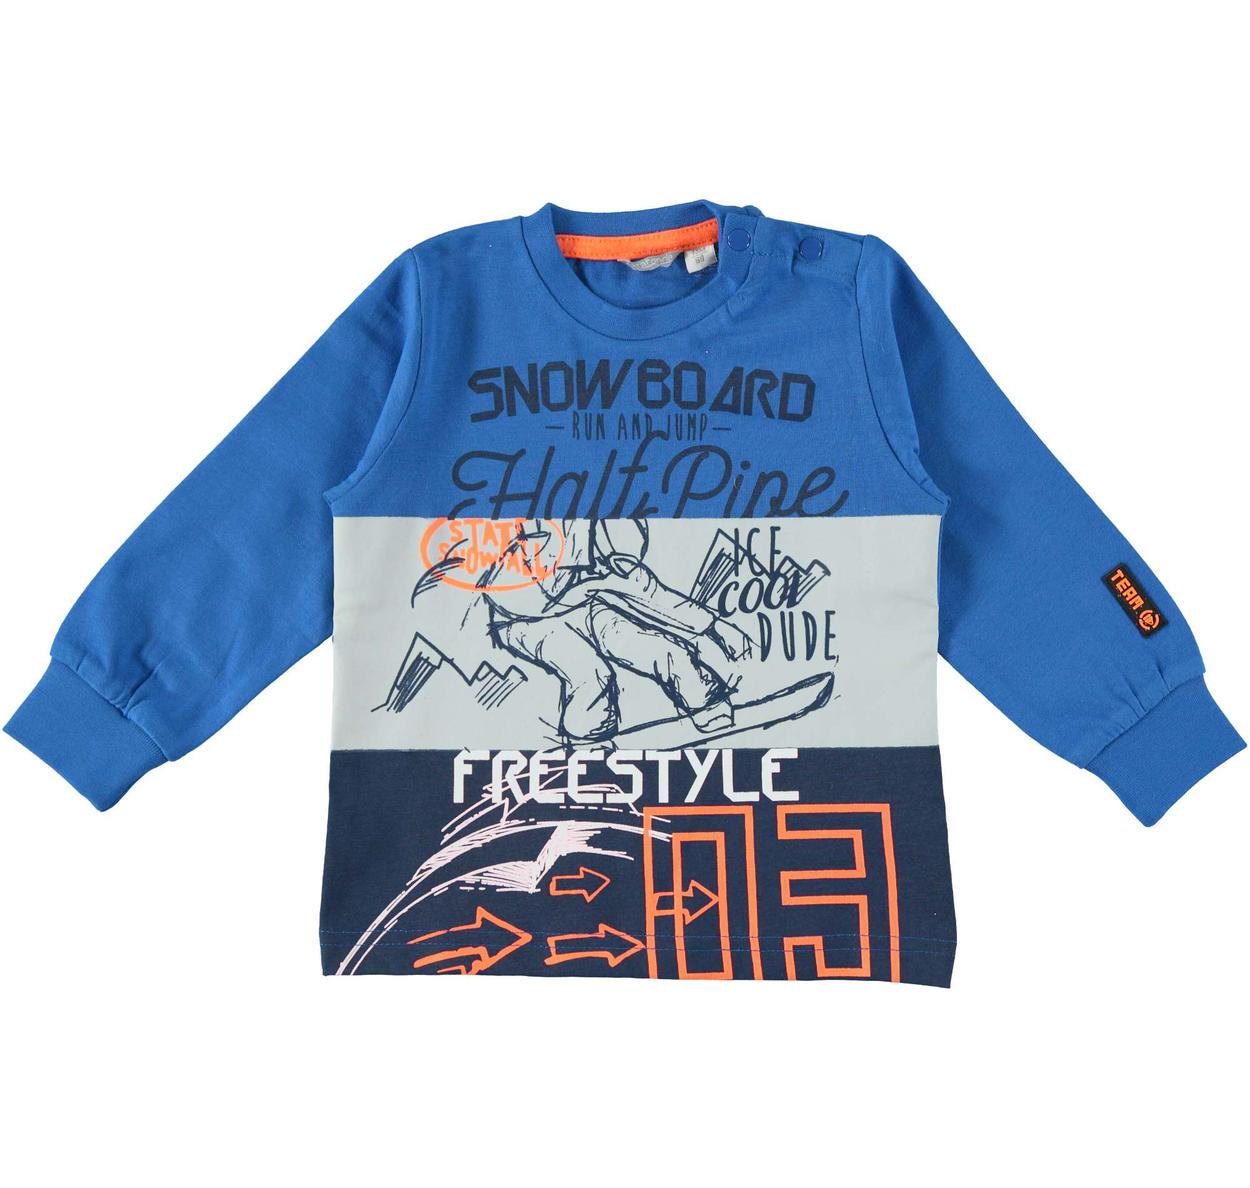 025bdcab3b Maglietta in caldo cotone tema snowboard per bambino da 6 mesi a 7 anni  Sarabanda